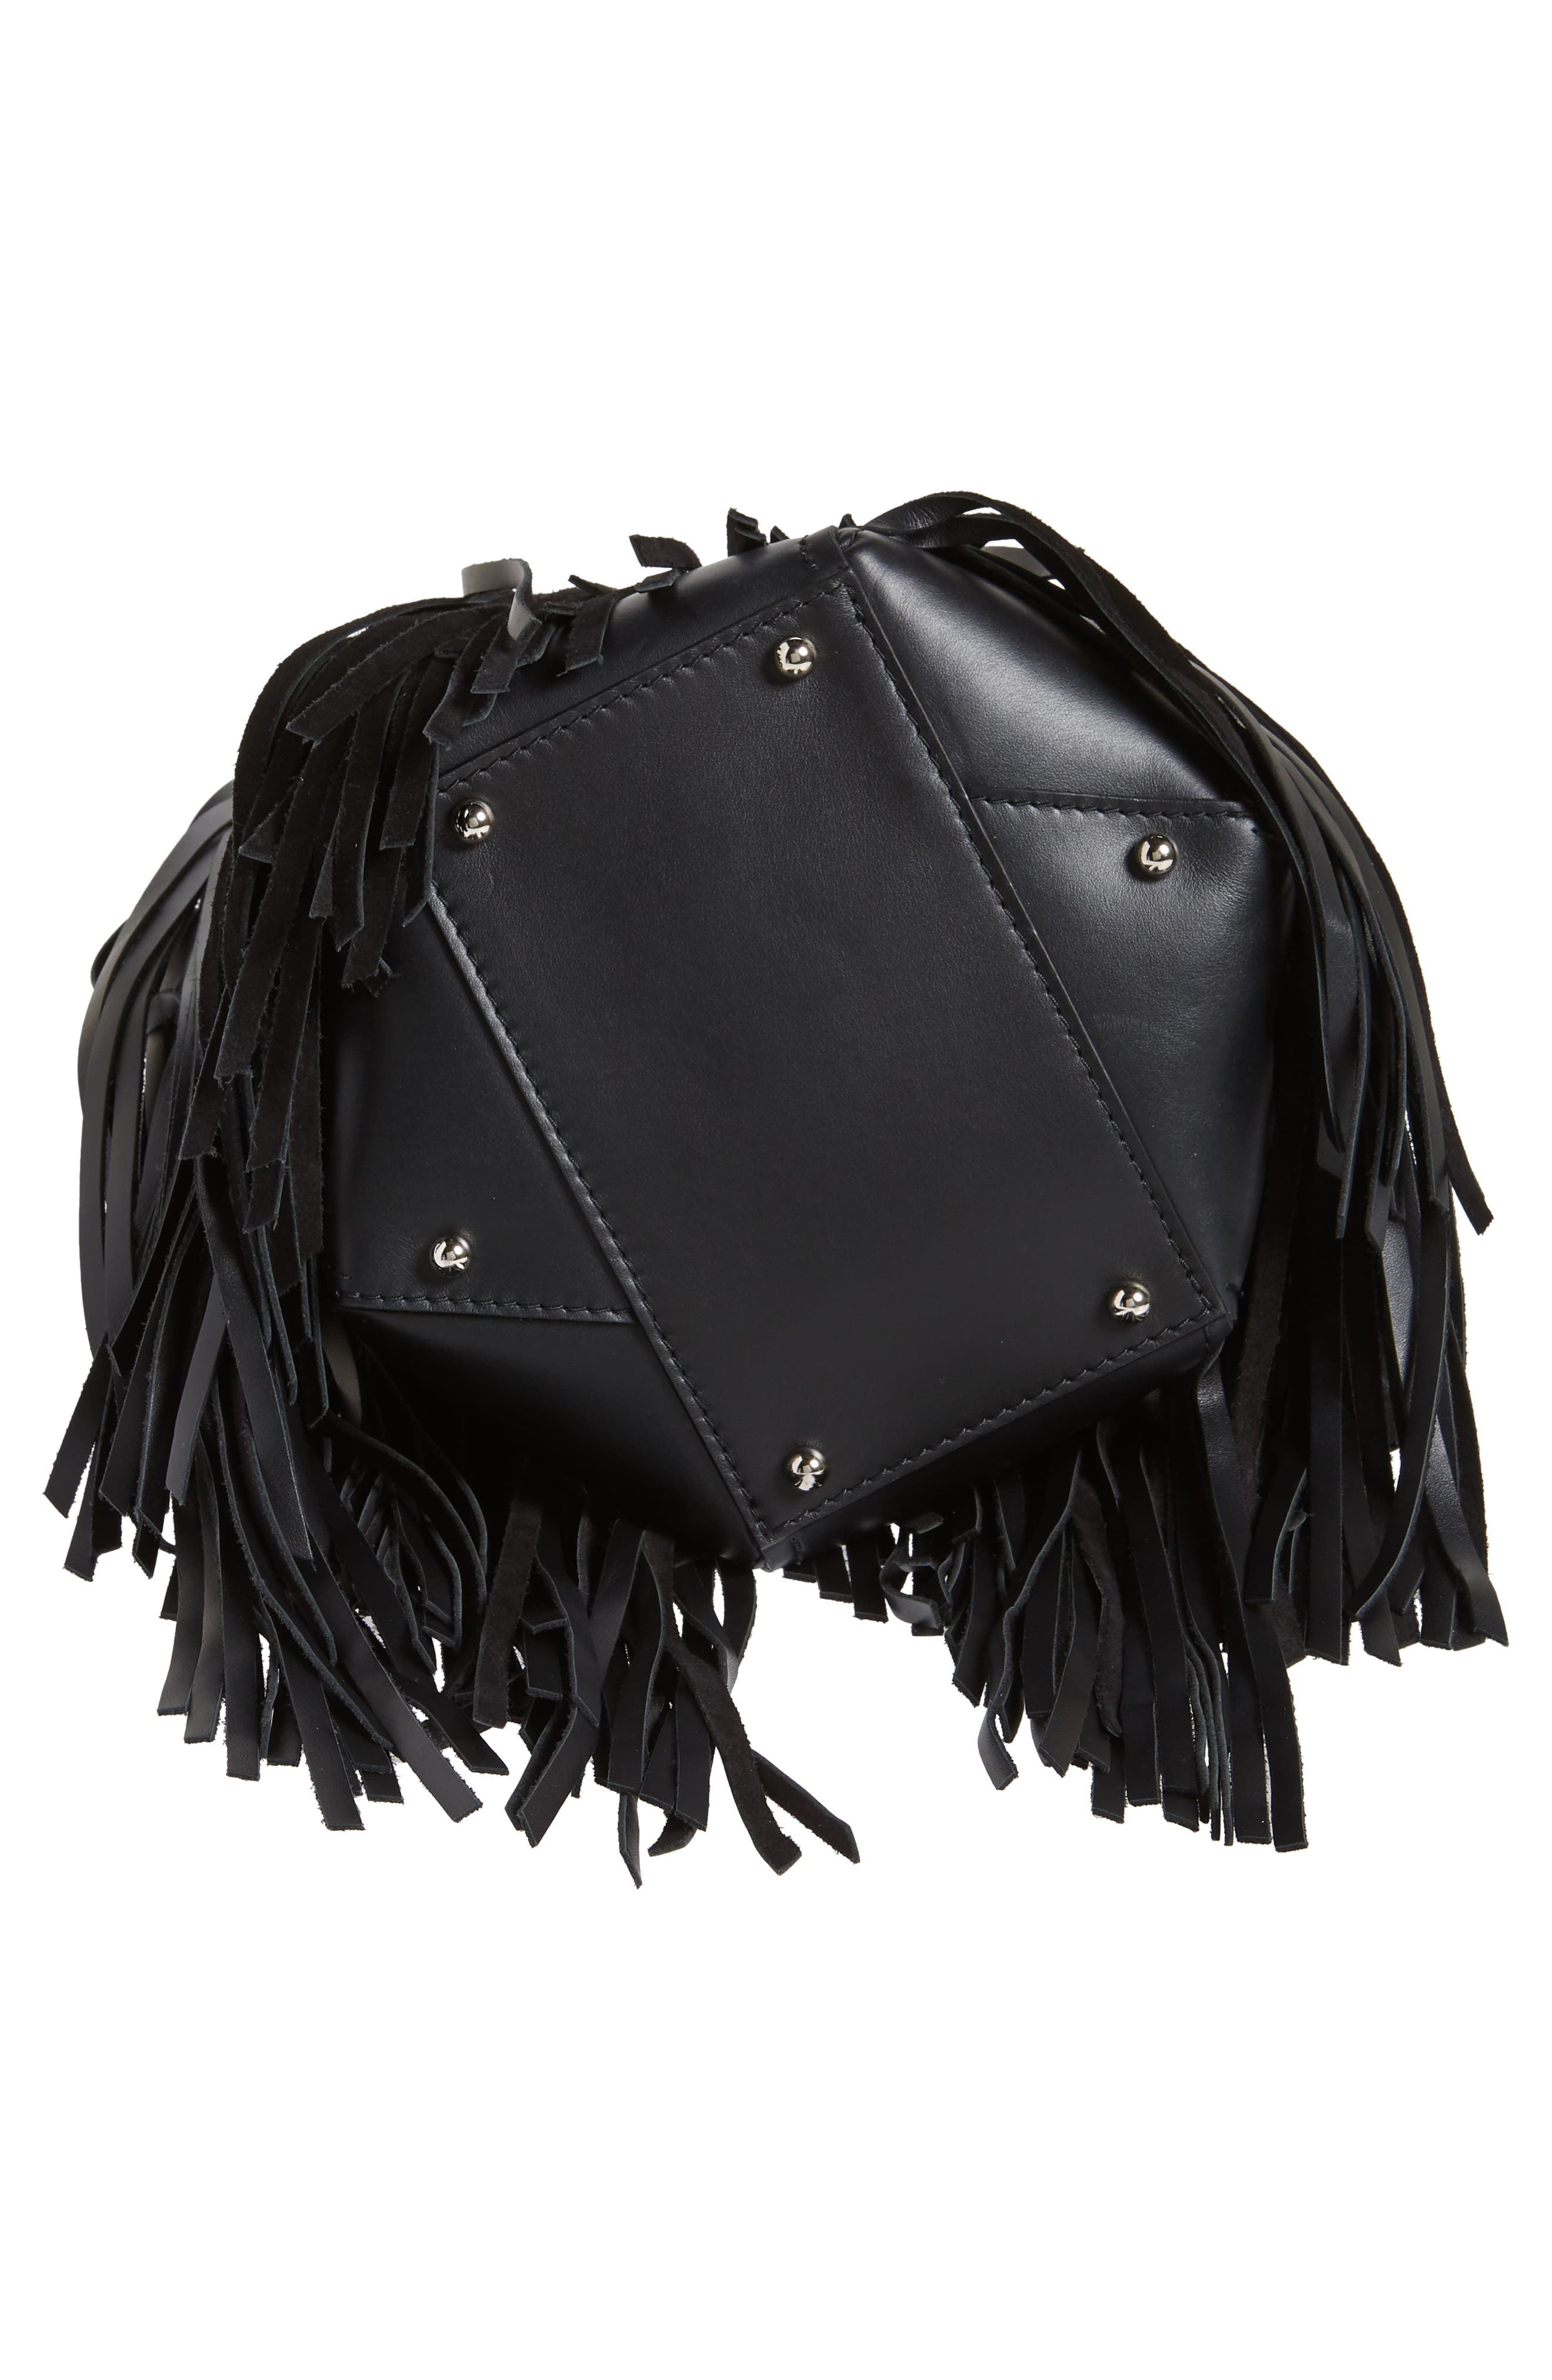 PROENZA SCHOULER, Medium Hex Fringe Calfskin Leather Bucket Bag, Alternate thumbnail 6, color, BLACK/ BLACK